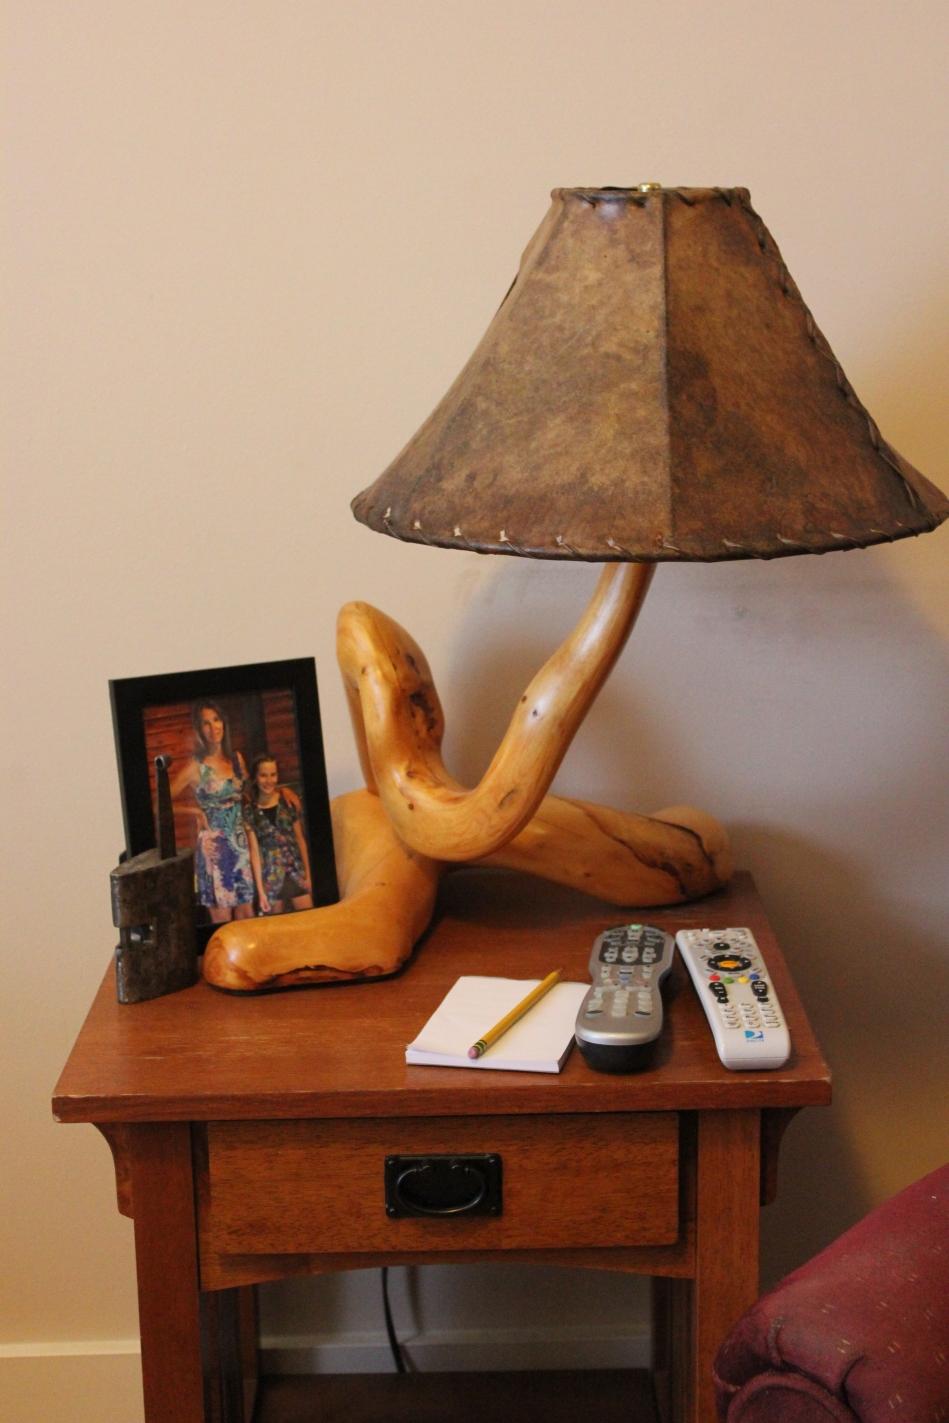 Office table lamp c jack waller jrs southwest montana tree art my tree art appreciation office table lamp geotapseo Gallery